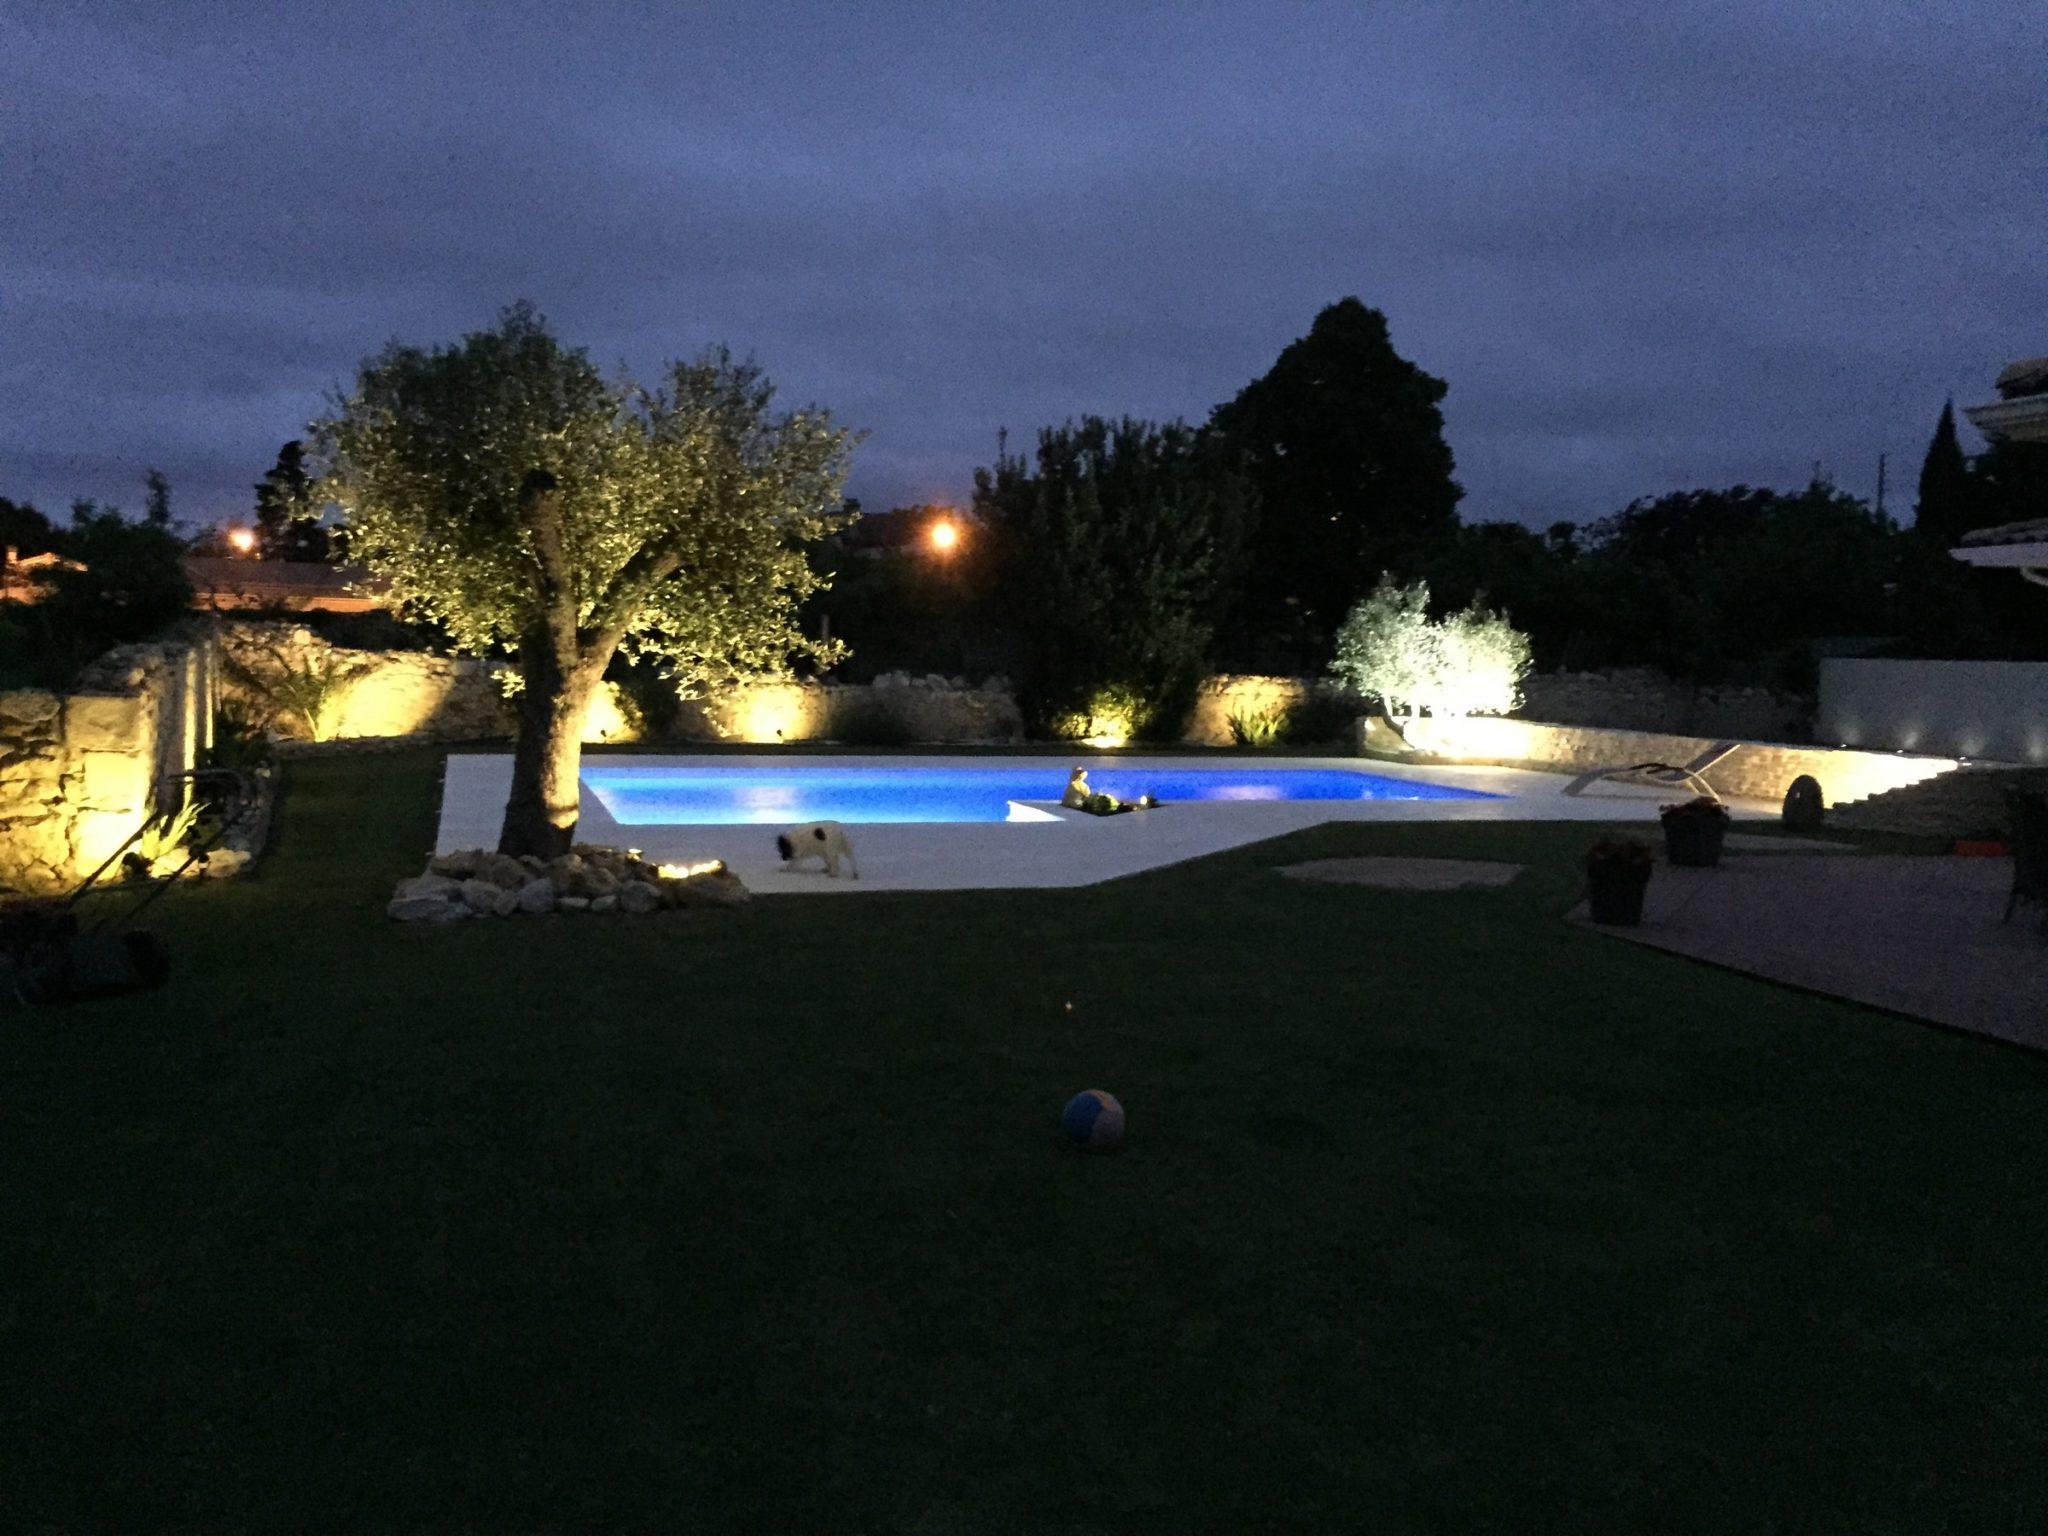 Piscine illumin e nocturne reference piscine for Constructeur de piscines